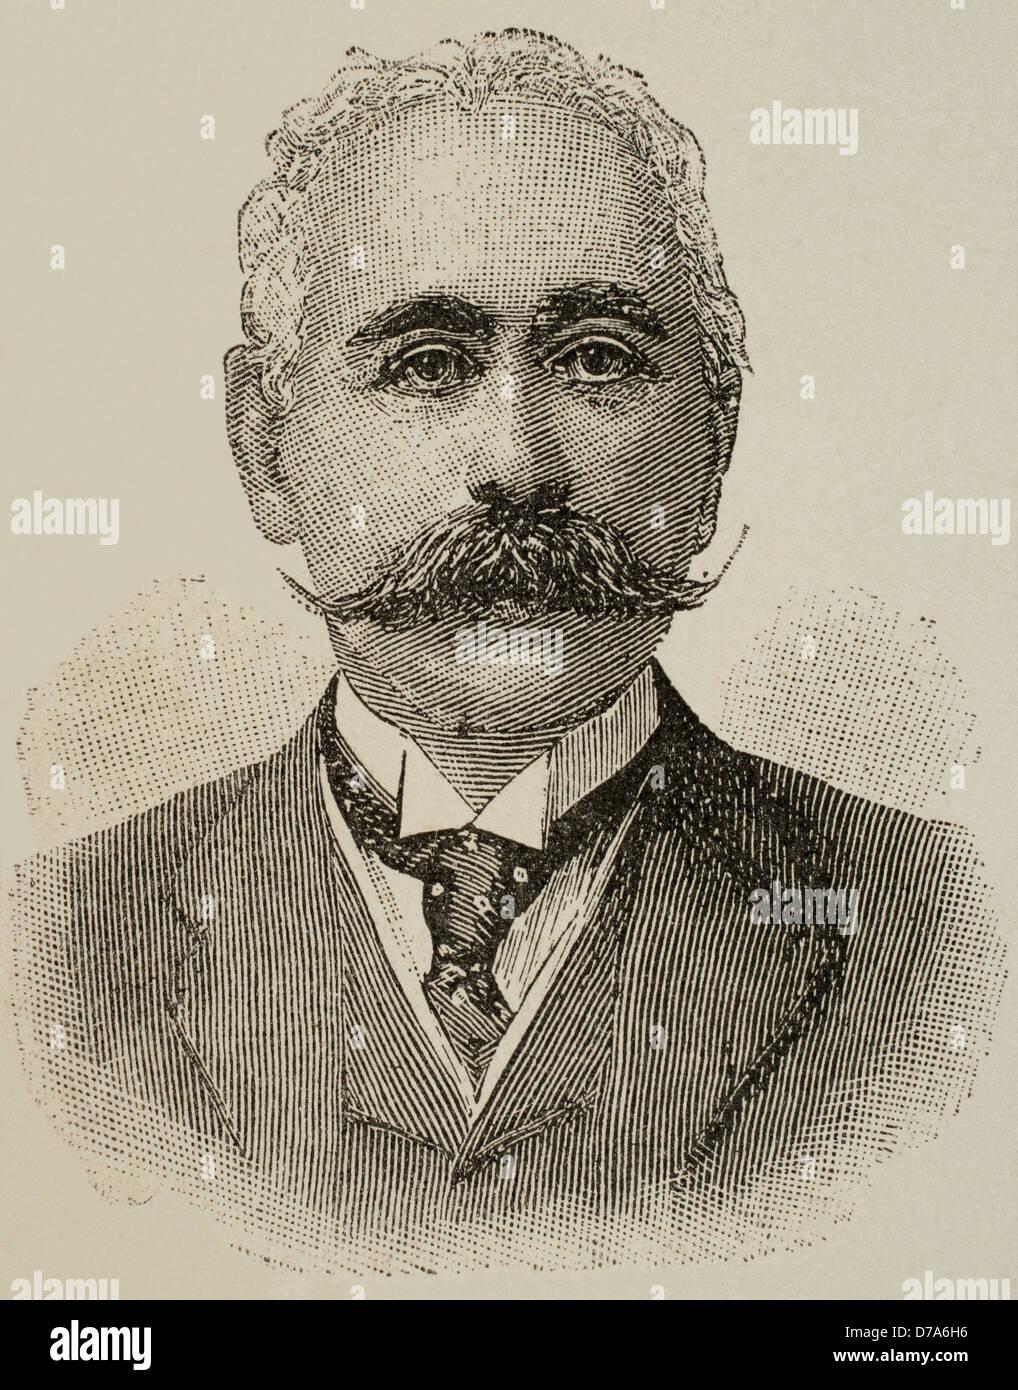 Maurice de Hirsch (1831-1896). Was a German-Jewish philanthropist. Portrait. engraving. - Stock Image